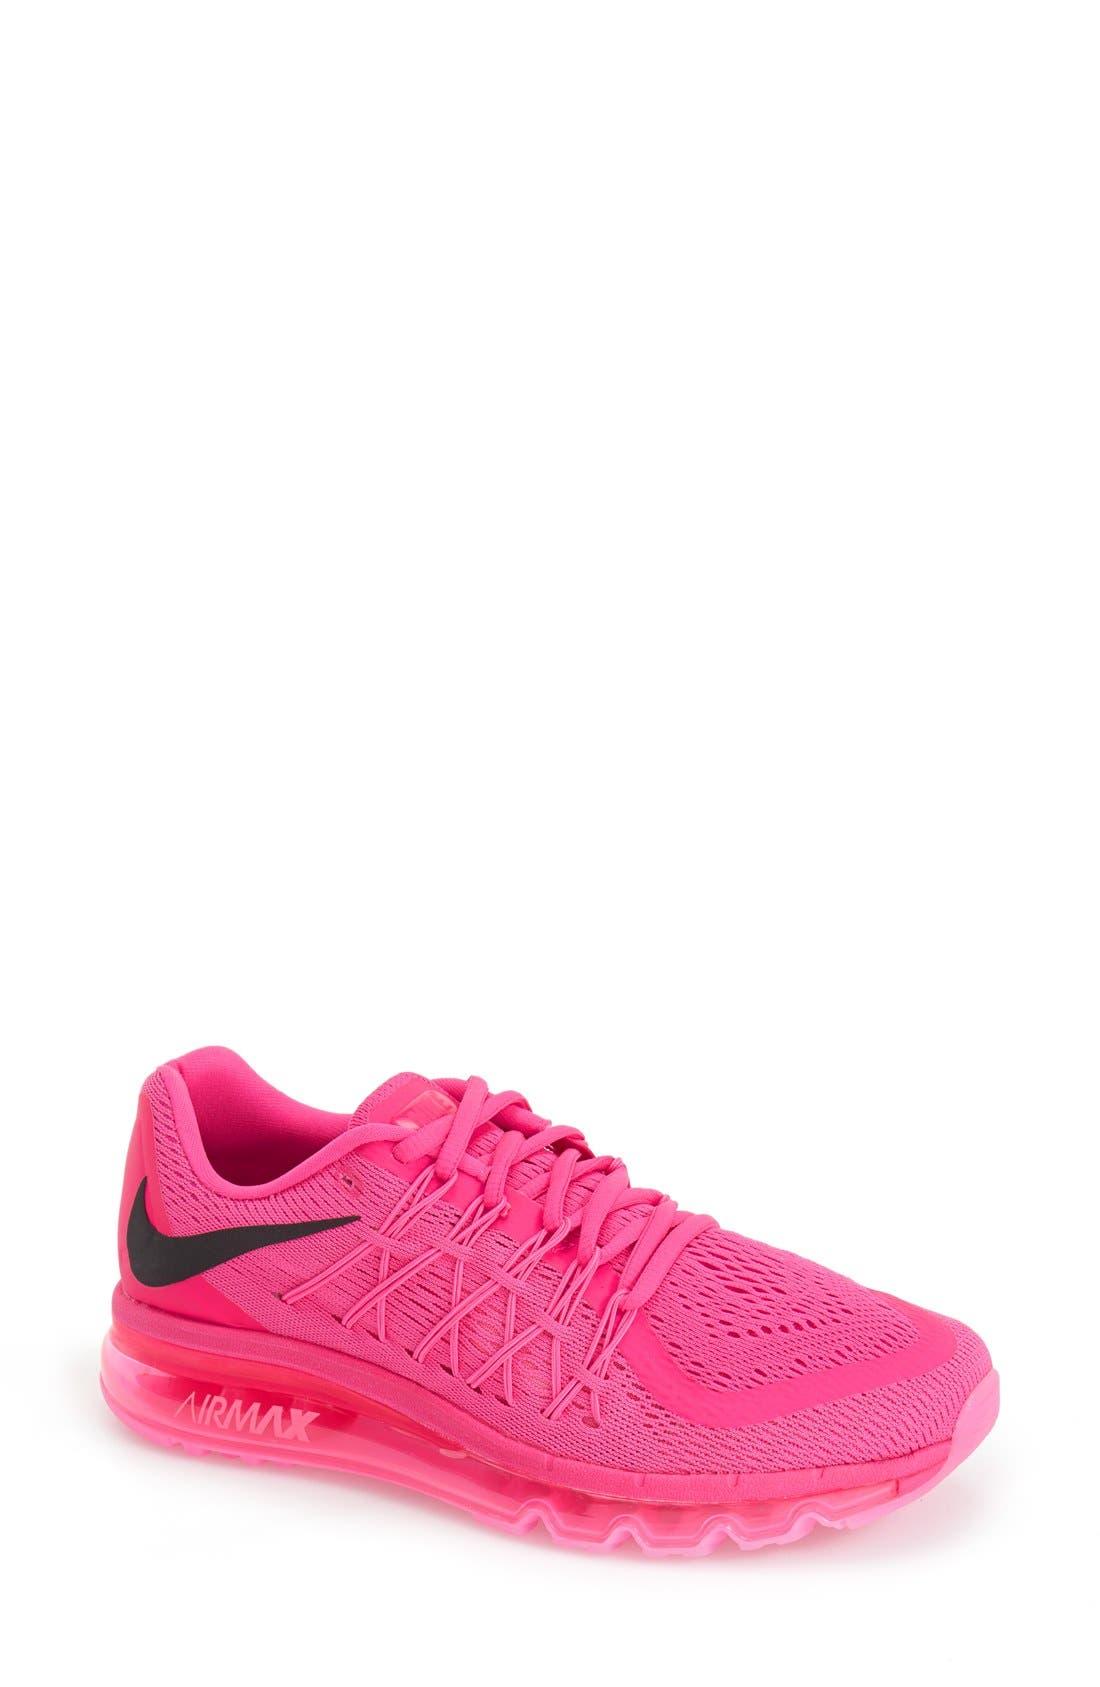 Alternate Image 1 Selected - Nike 'Air Max 15' Running Shoe (Women)